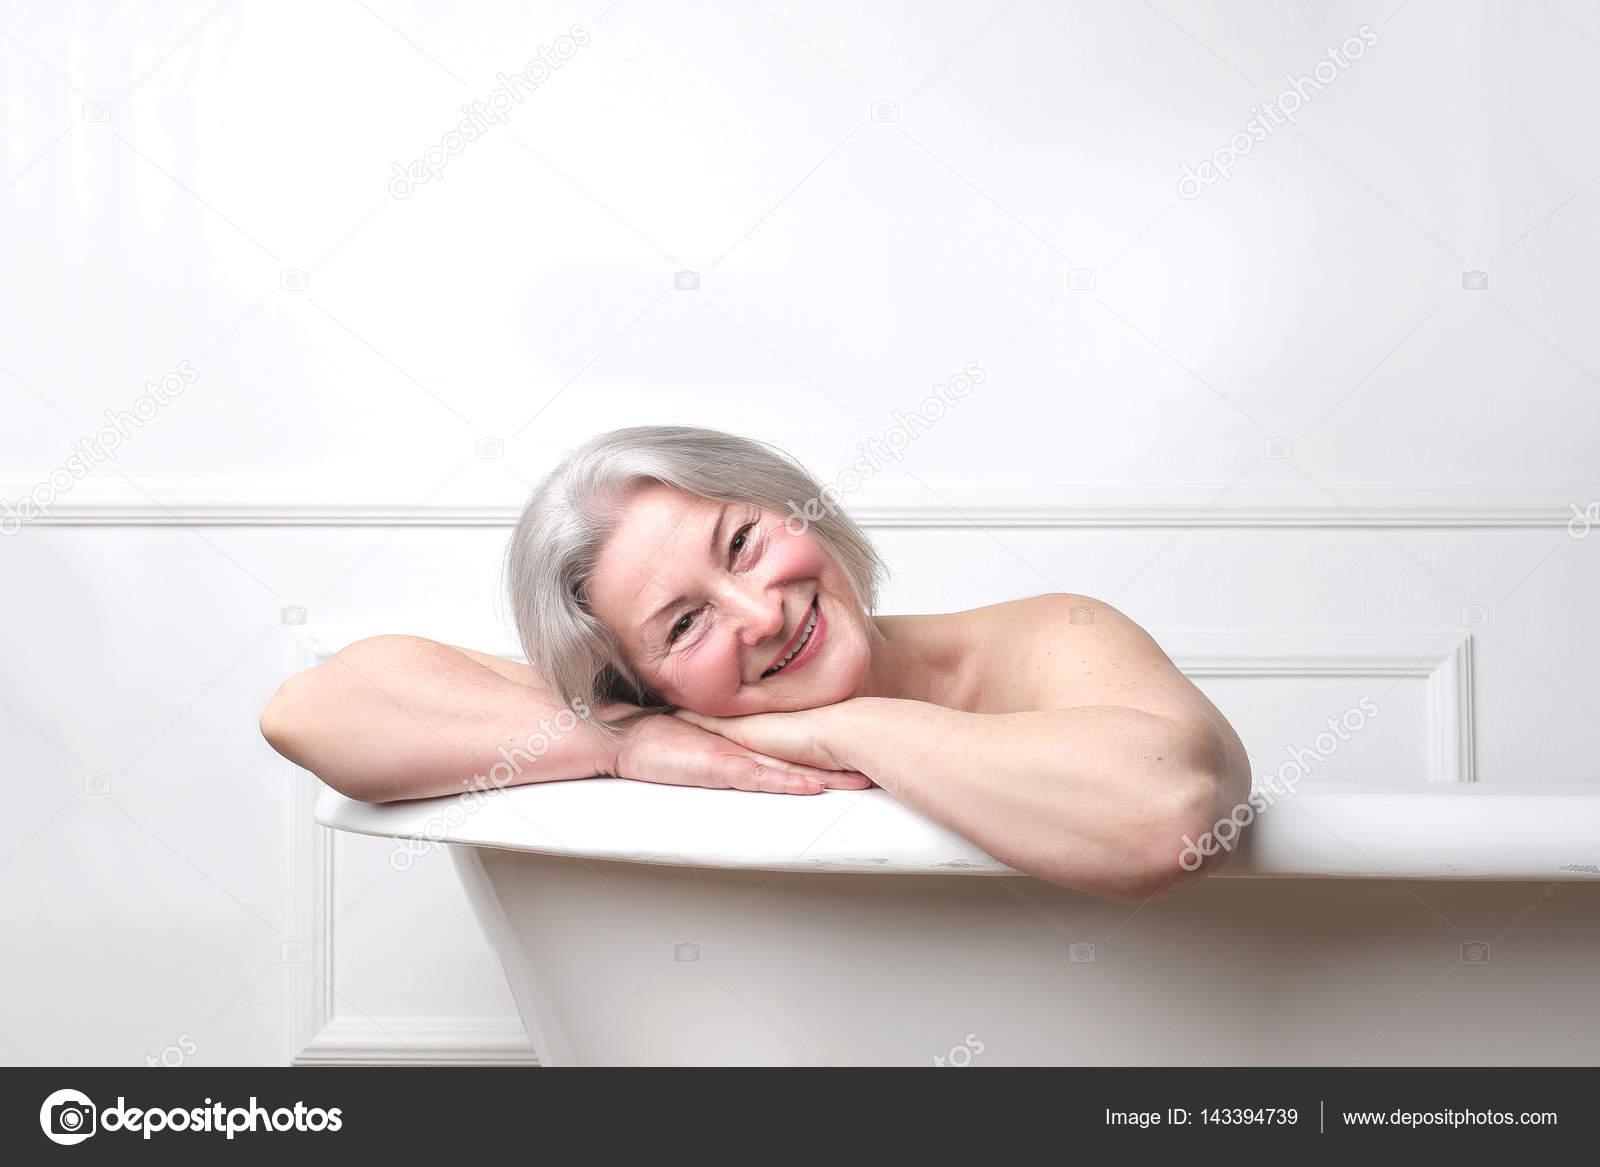 Older lady in bathtub — Stock Photo © olly18 #143394739